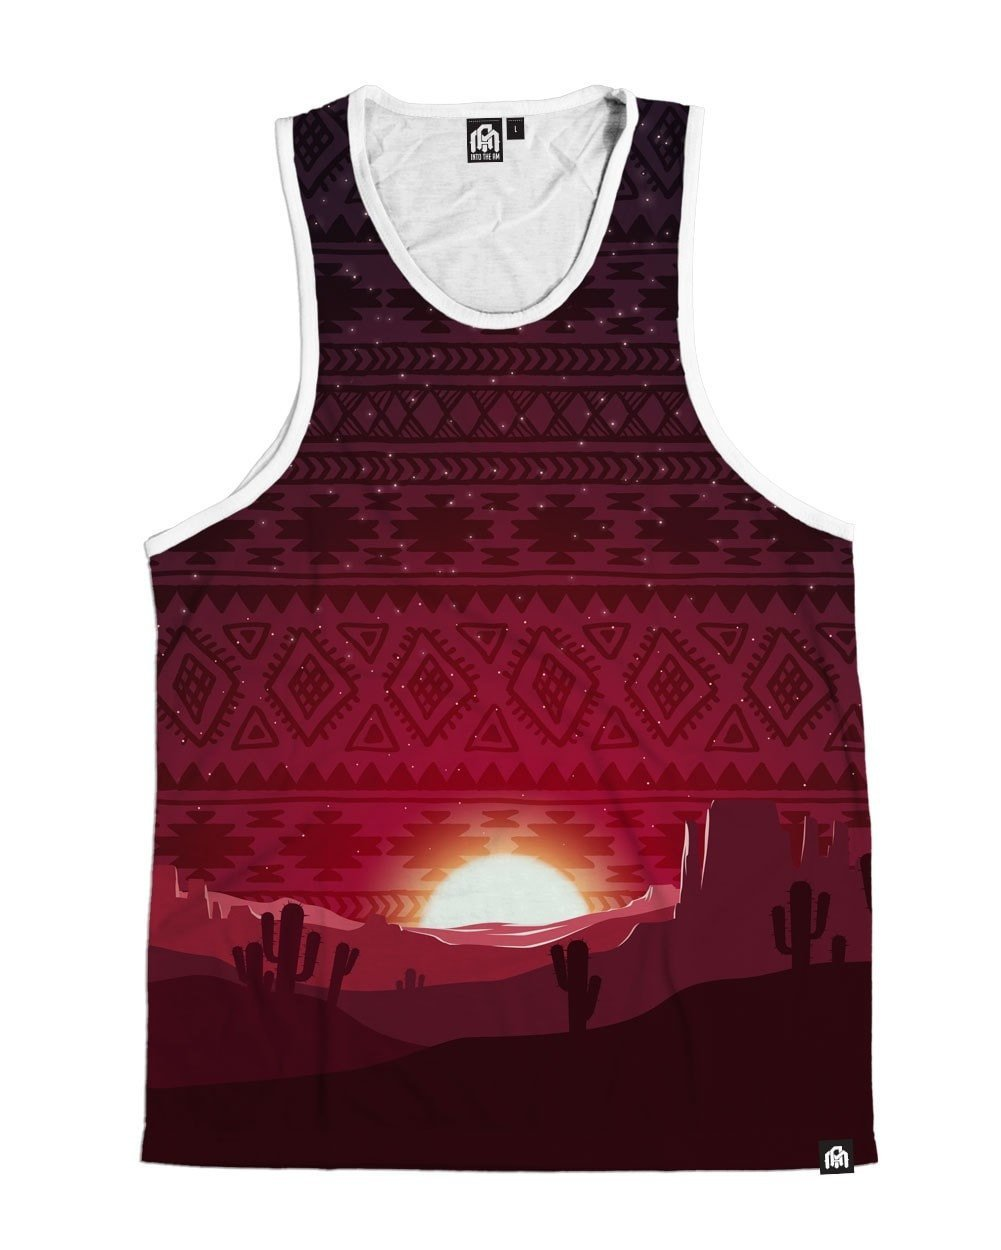 INTO THE AM Aztec Sunset Men's Sleeveless Tank Top Shirt (Medium) by INTO THE AM